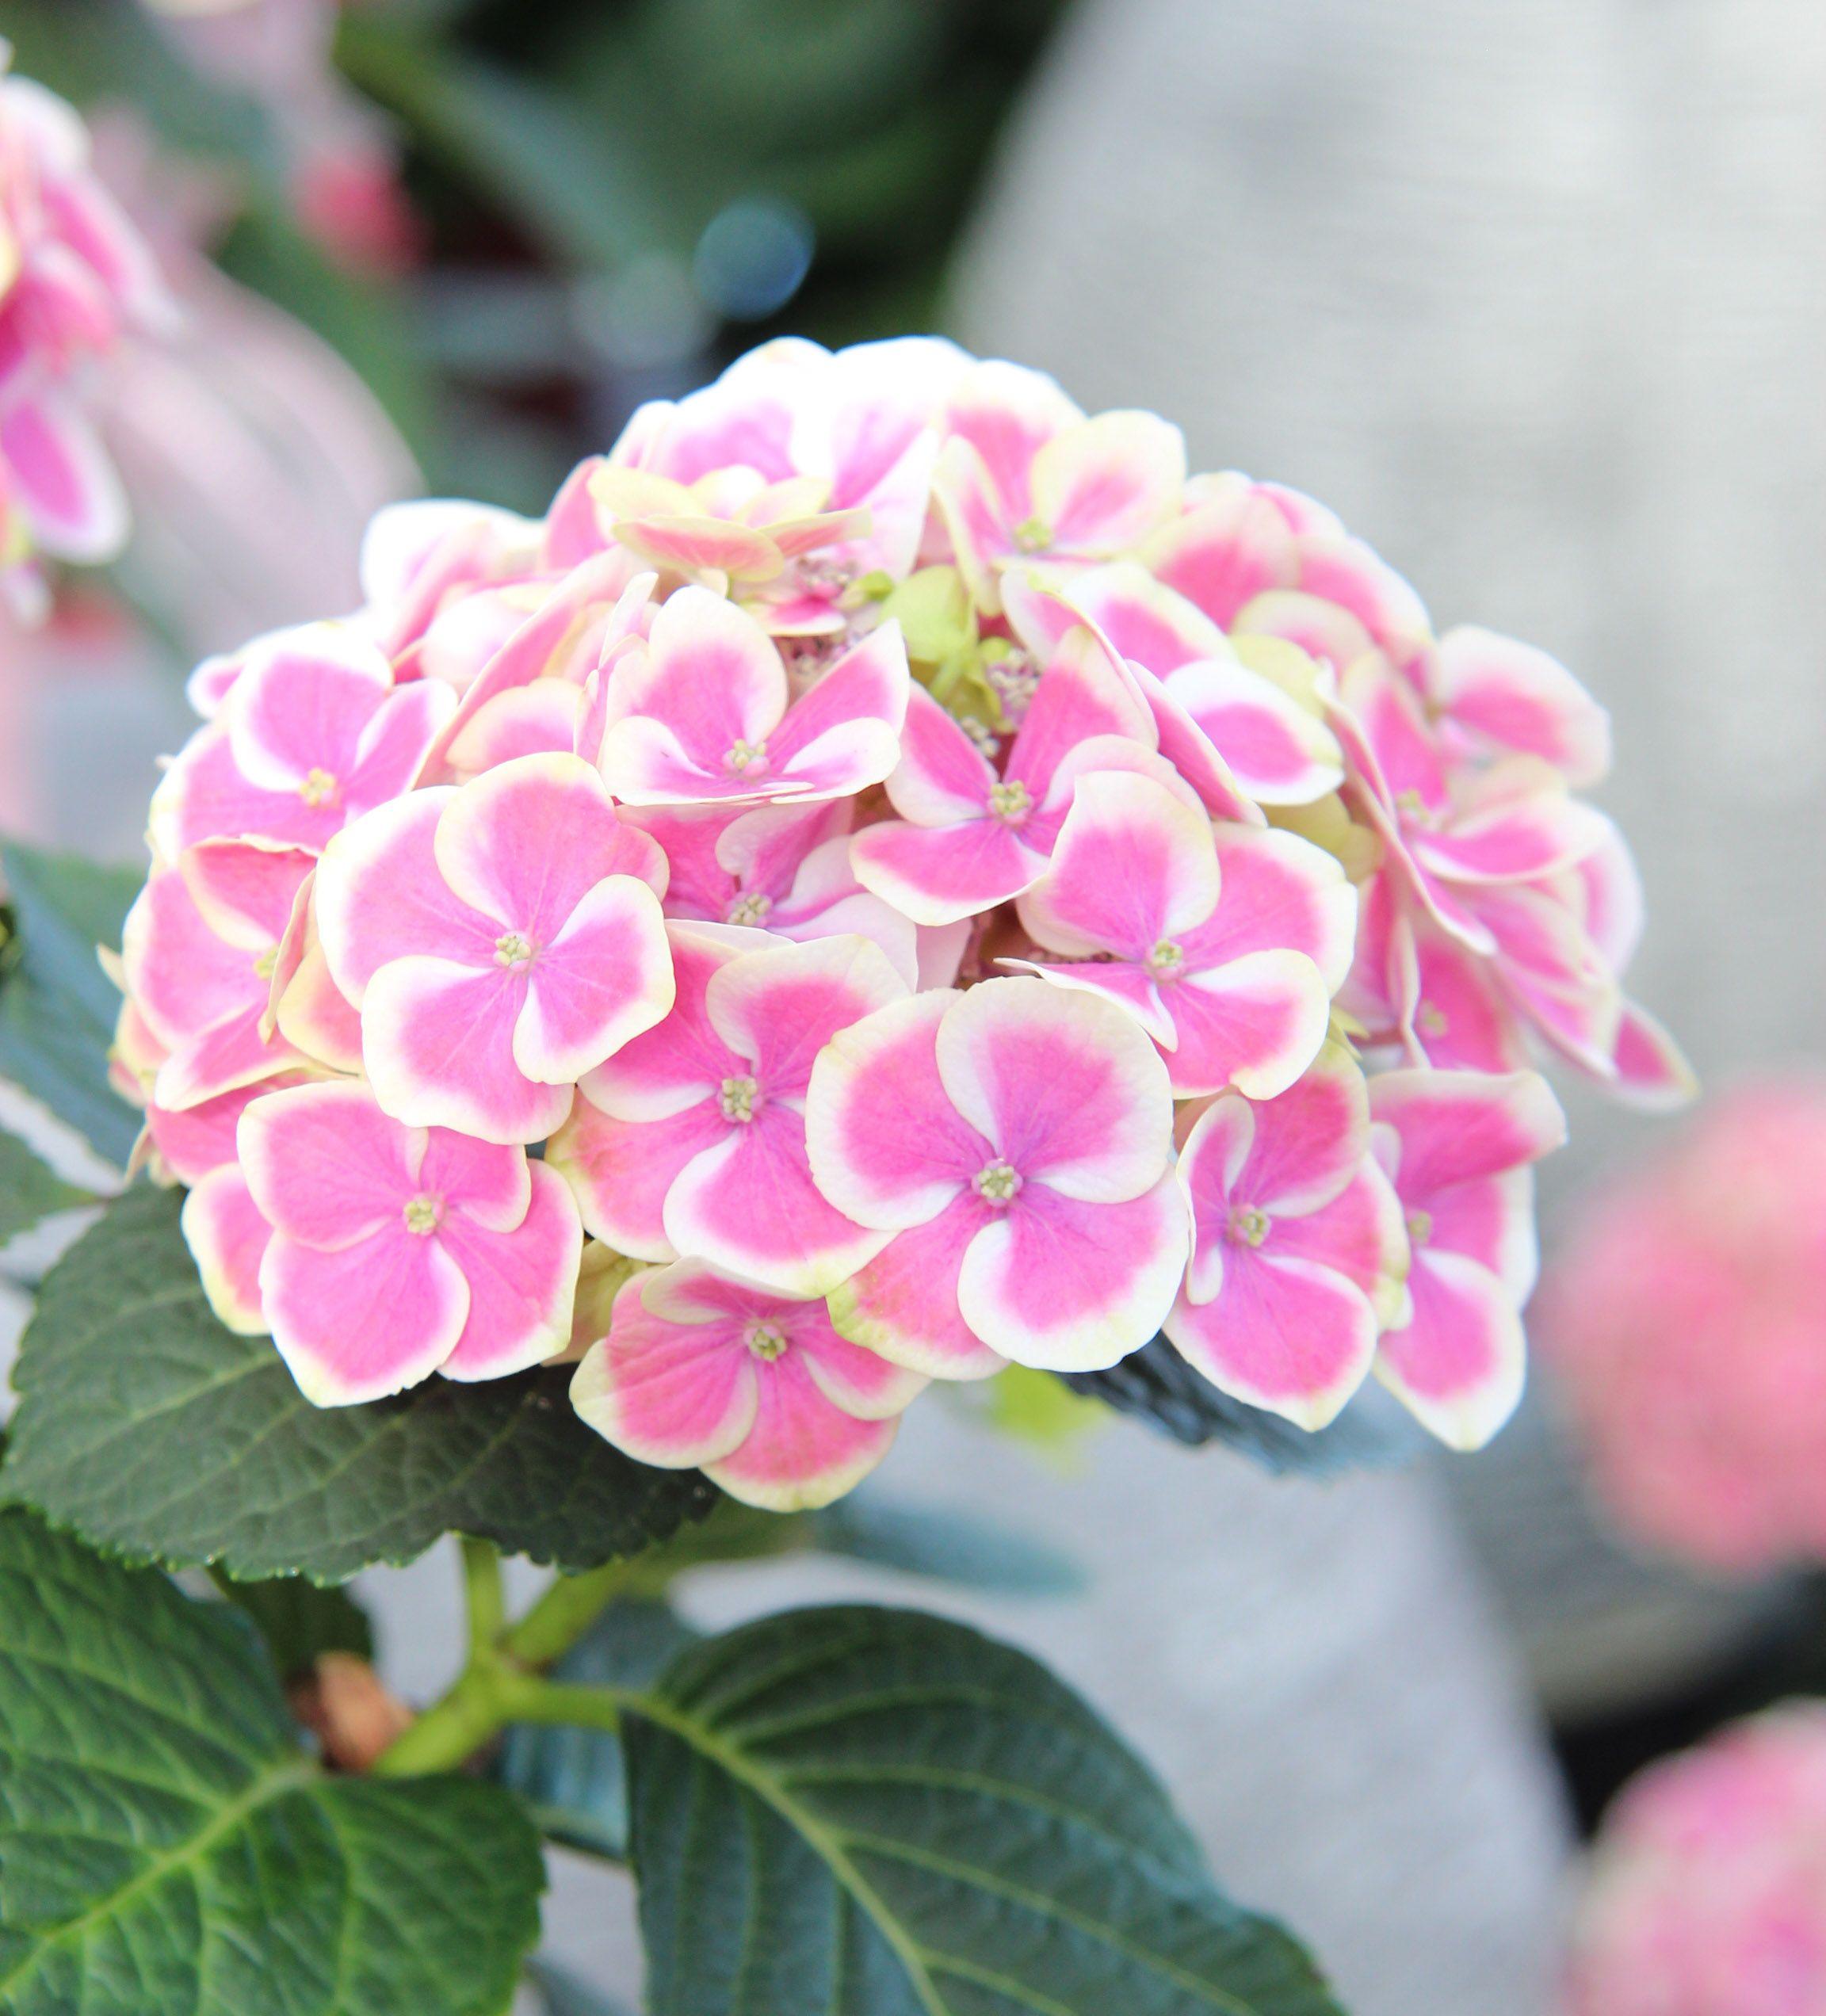 Hydrangea Plant nursery, Growing herbs indoors, Hydrangea